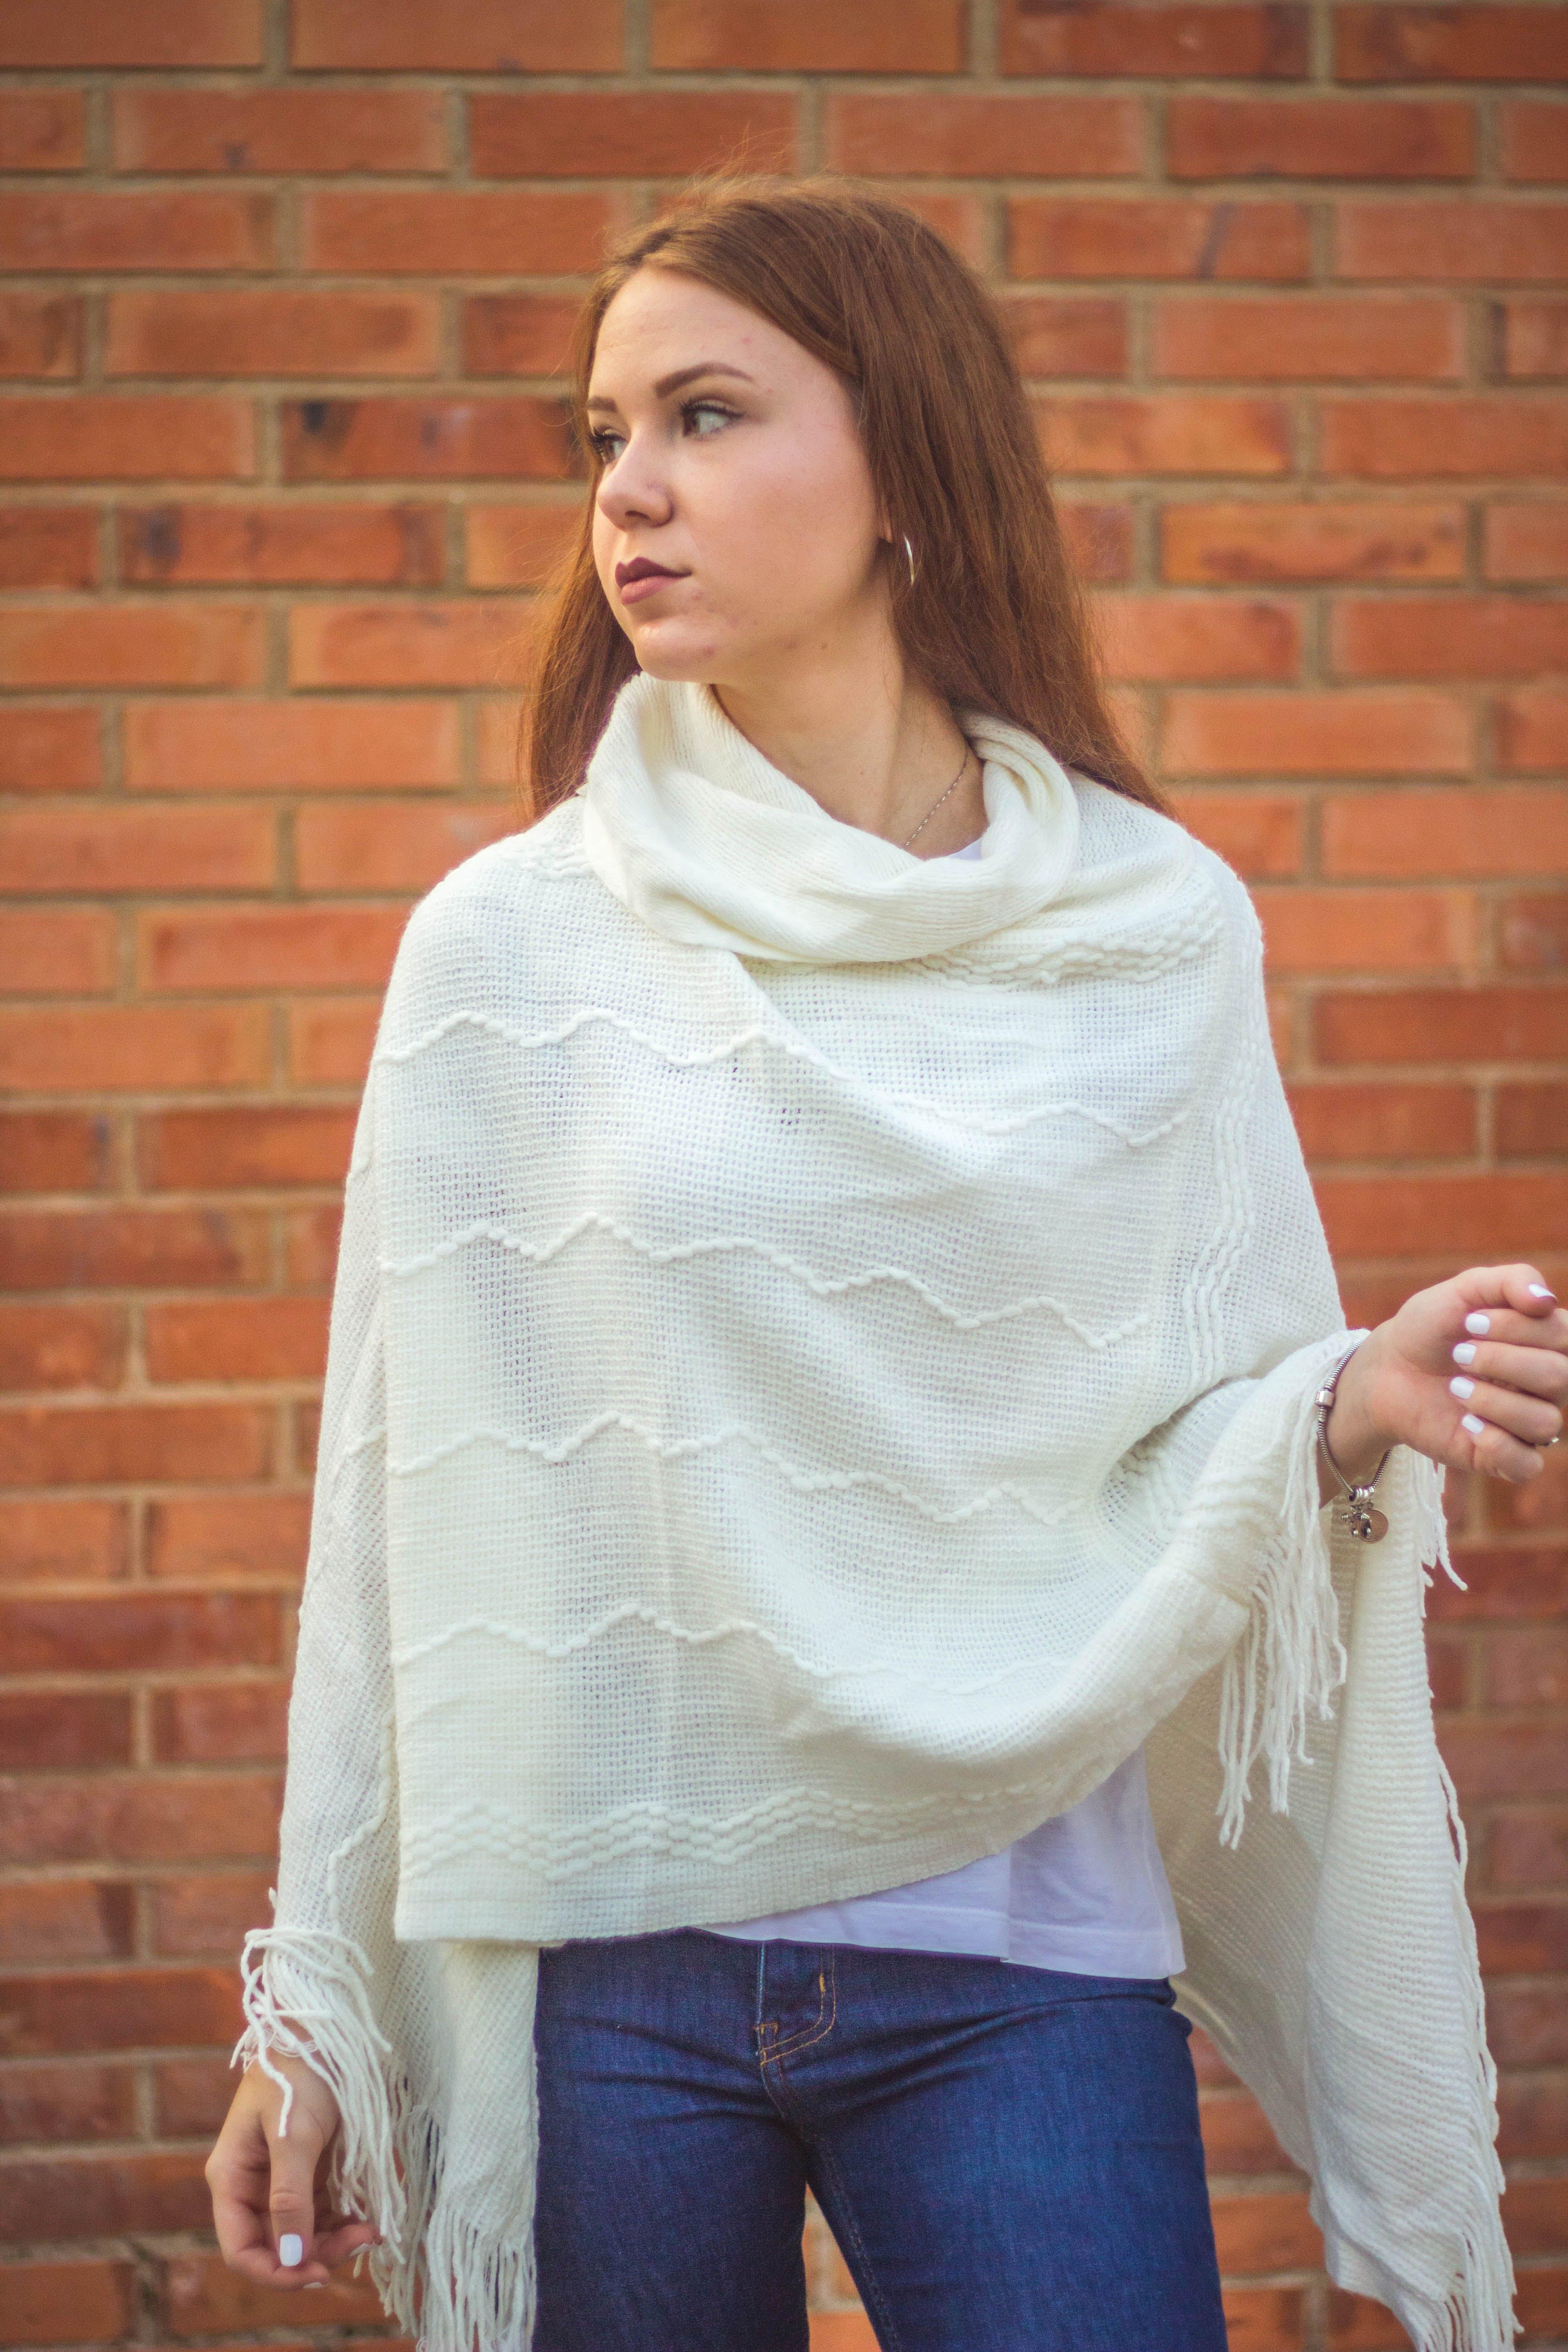 Woman wearing a white shawl looking sideways